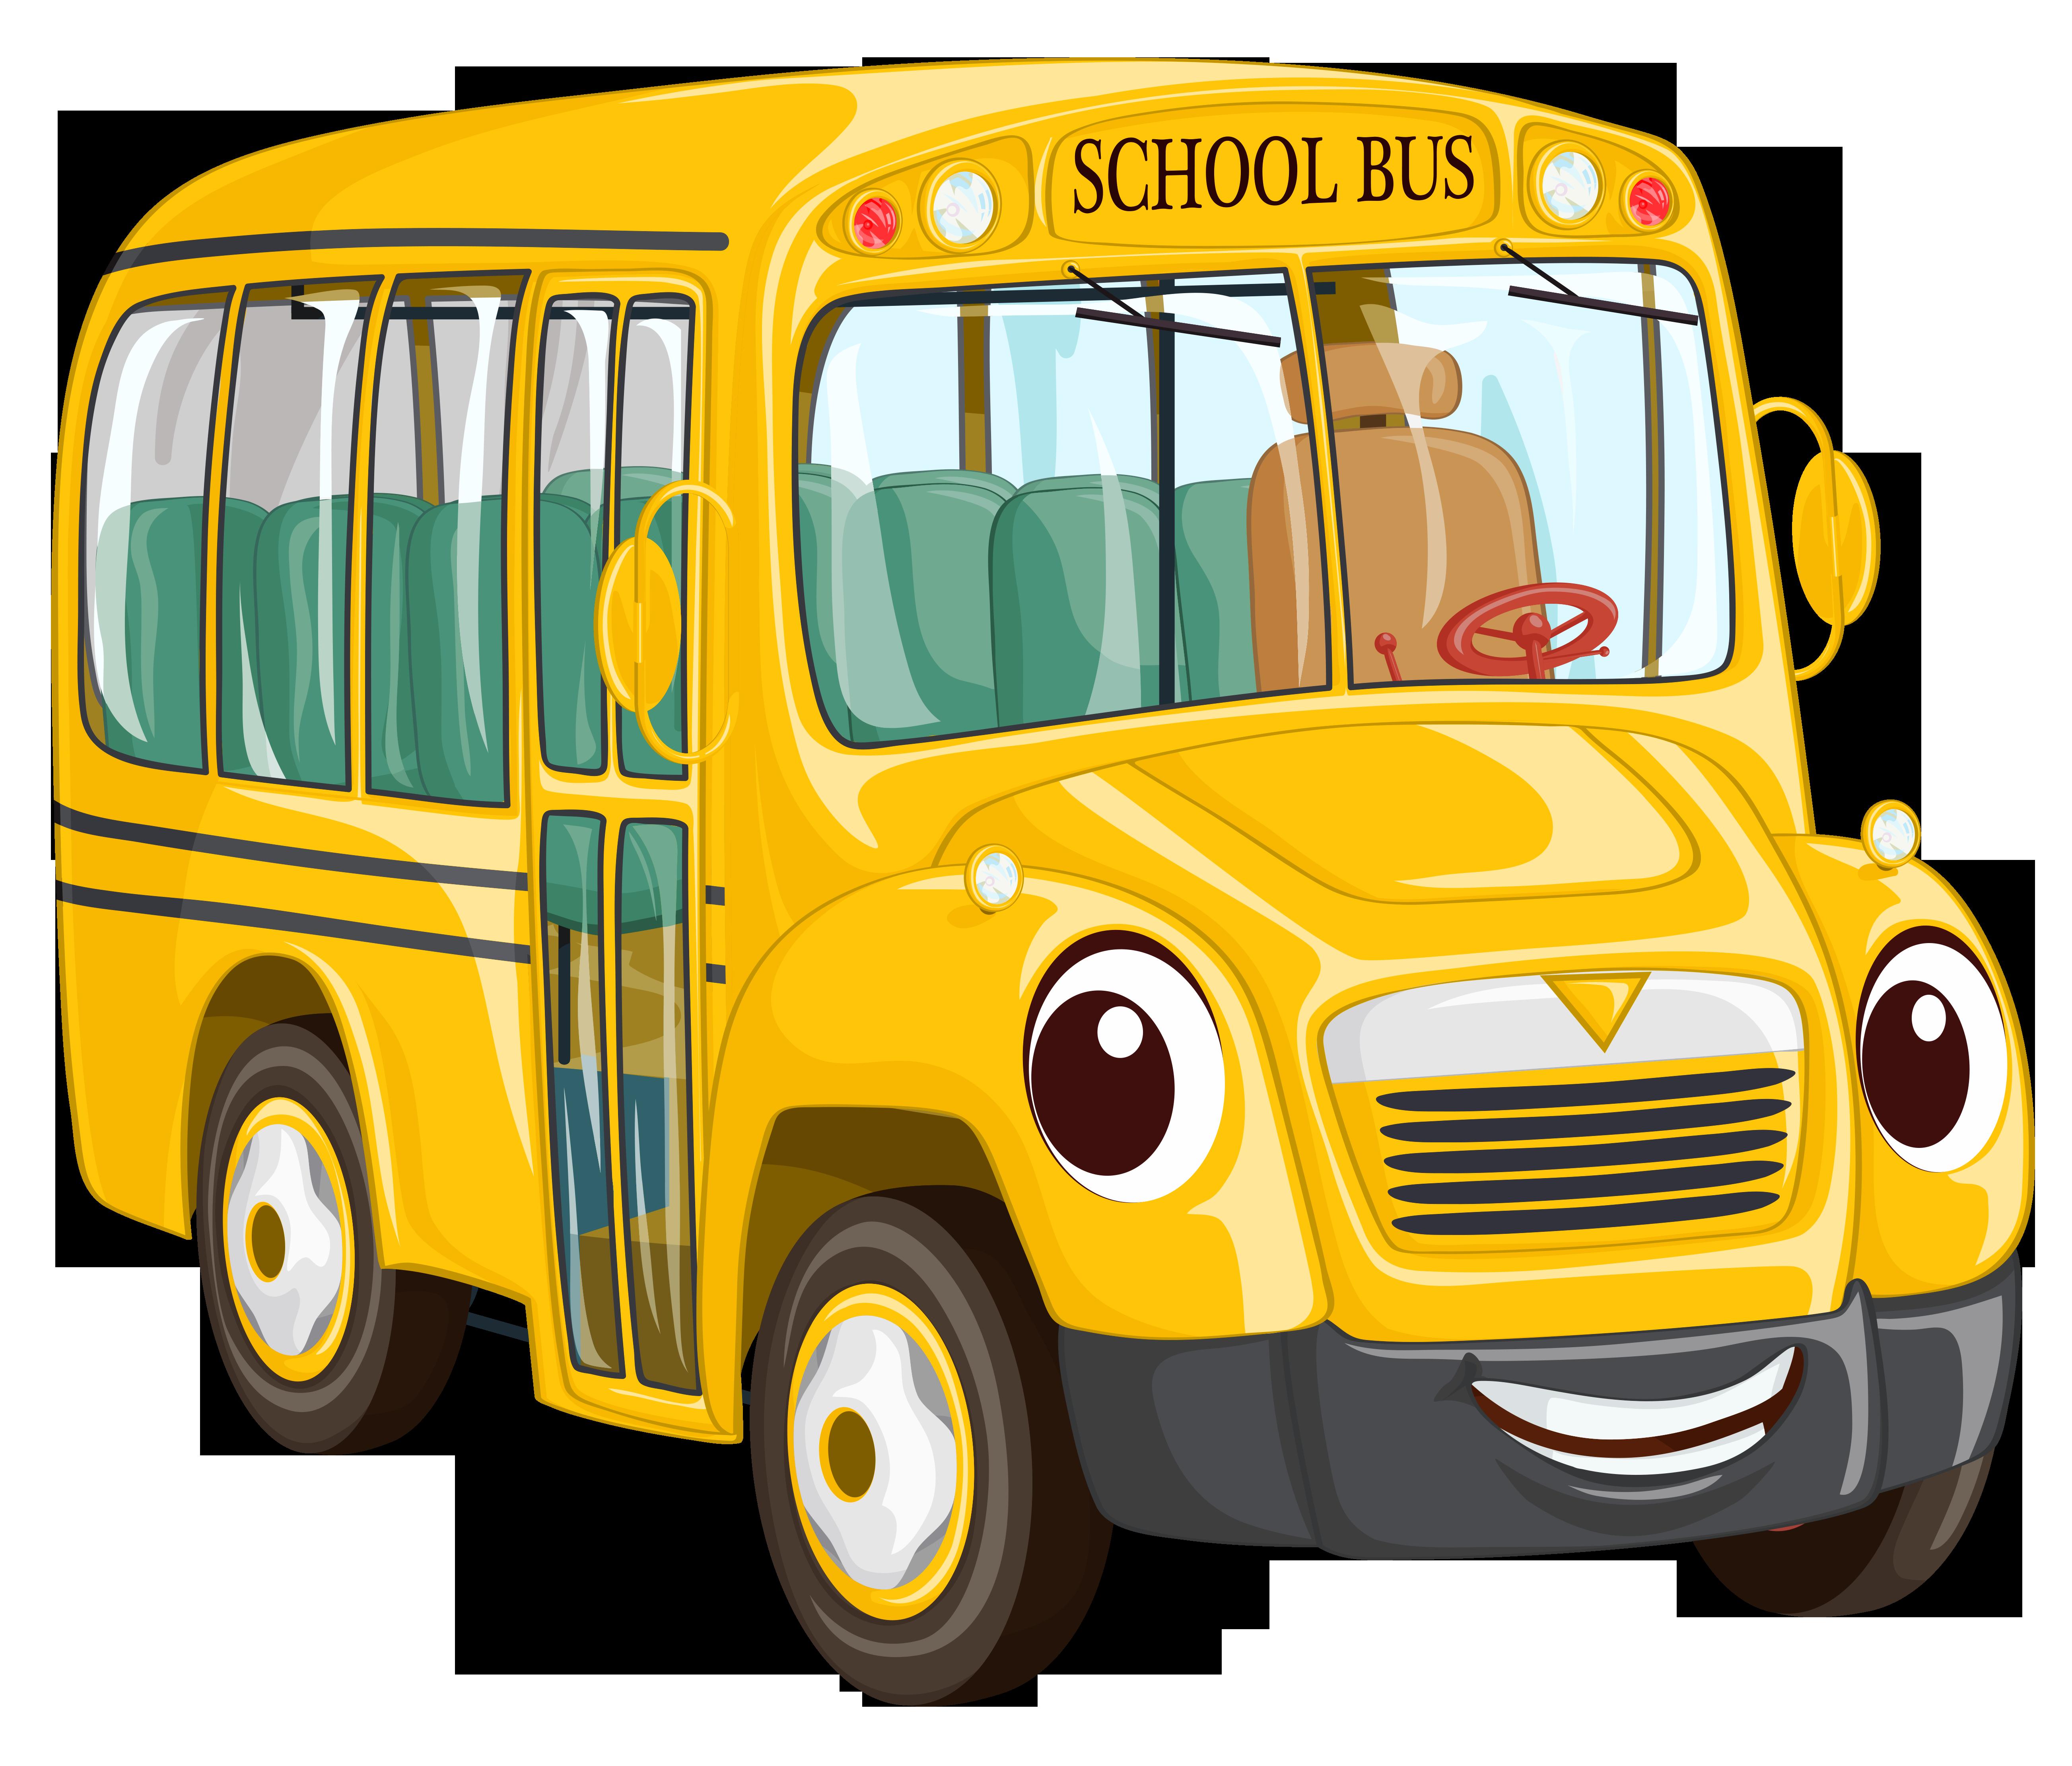 School bus clipart images 3 school bus c-School bus clipart images 3 school bus clip art vector 5 2-17